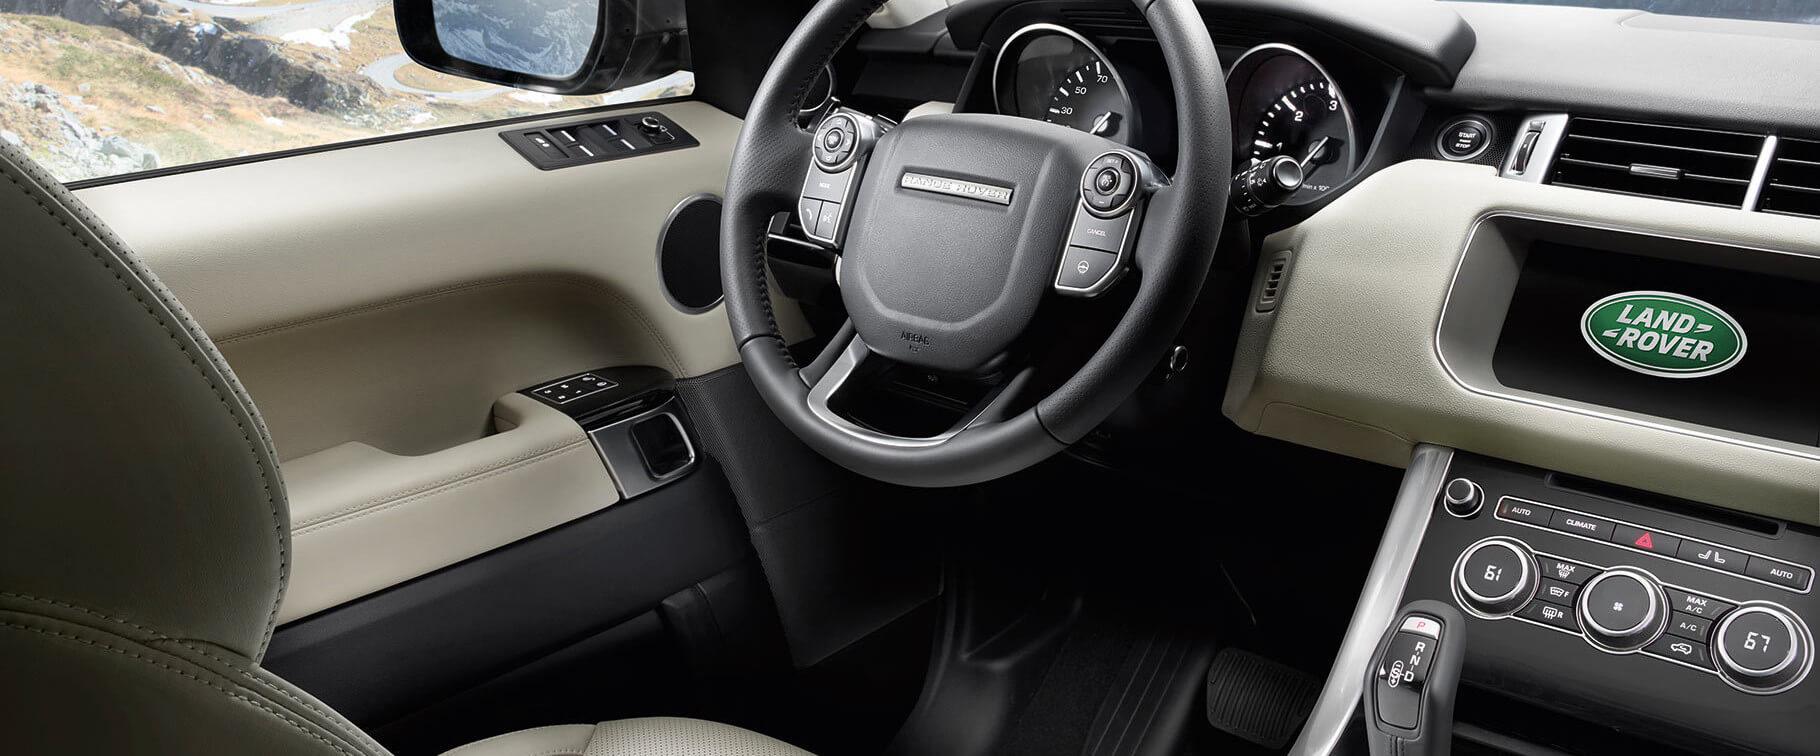 2017 Land Rover Range Rover Sport interior dash